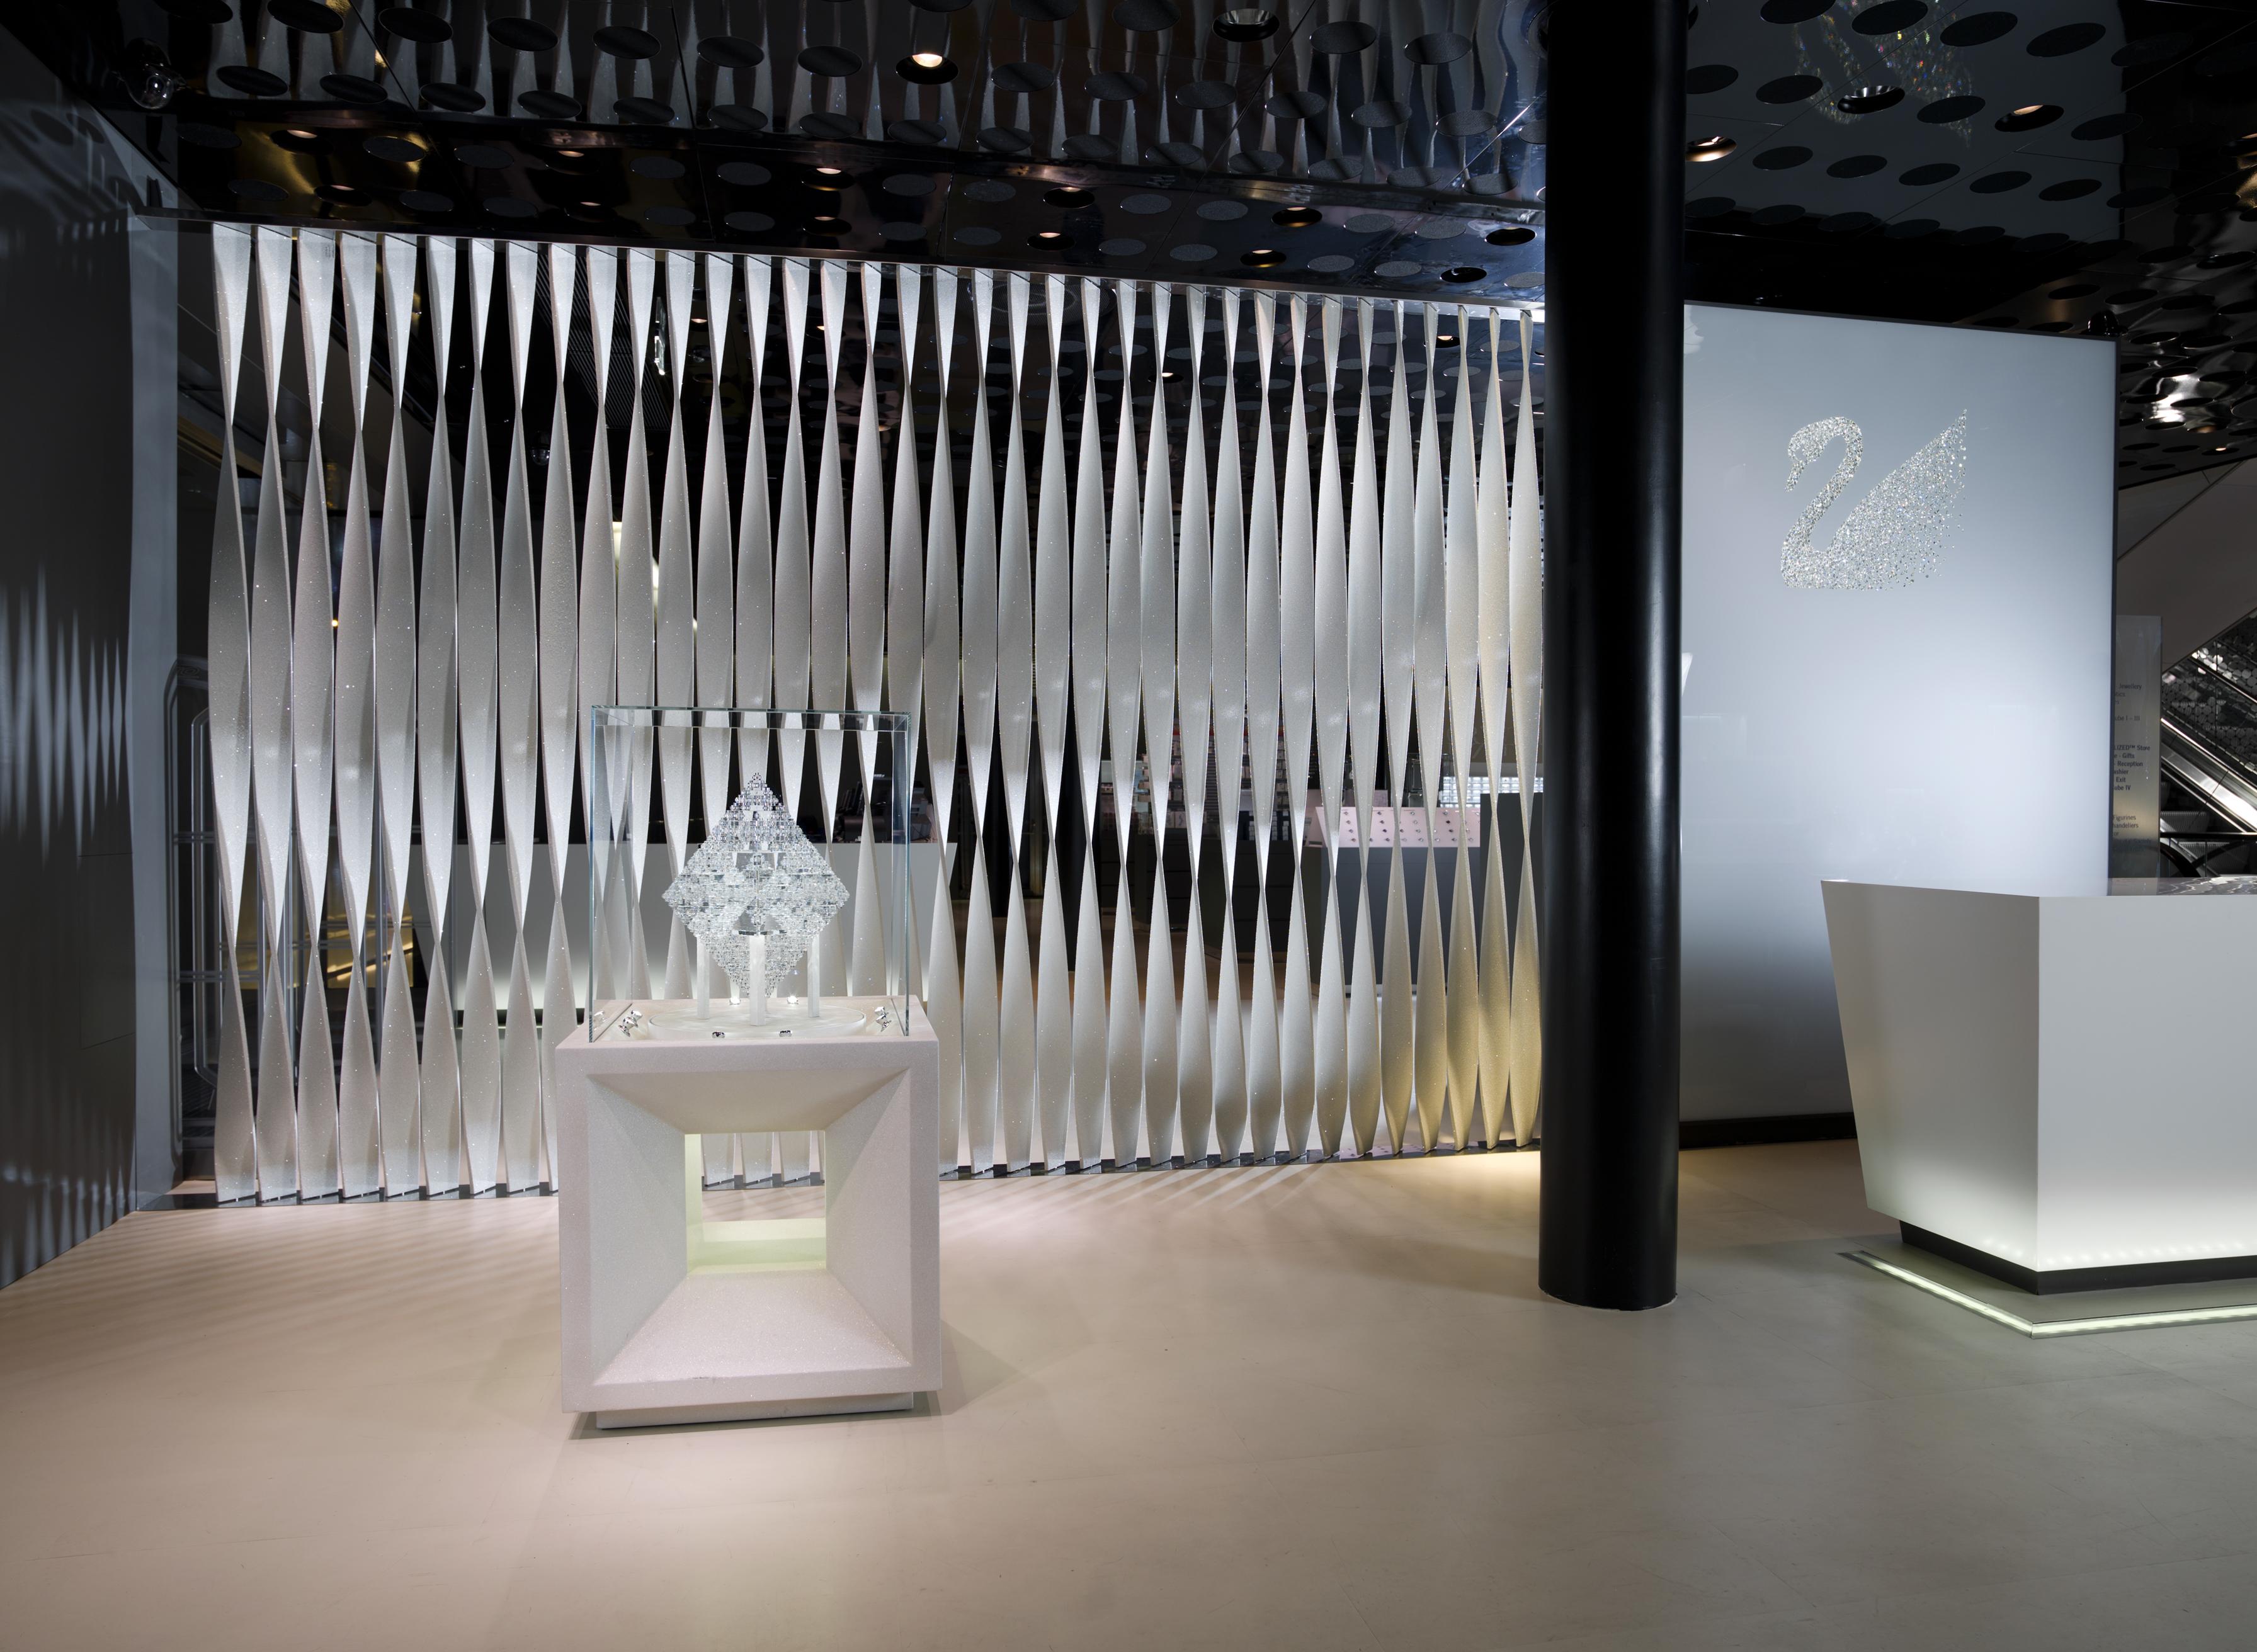 swarovski exhibition - Swarovski Interior Design